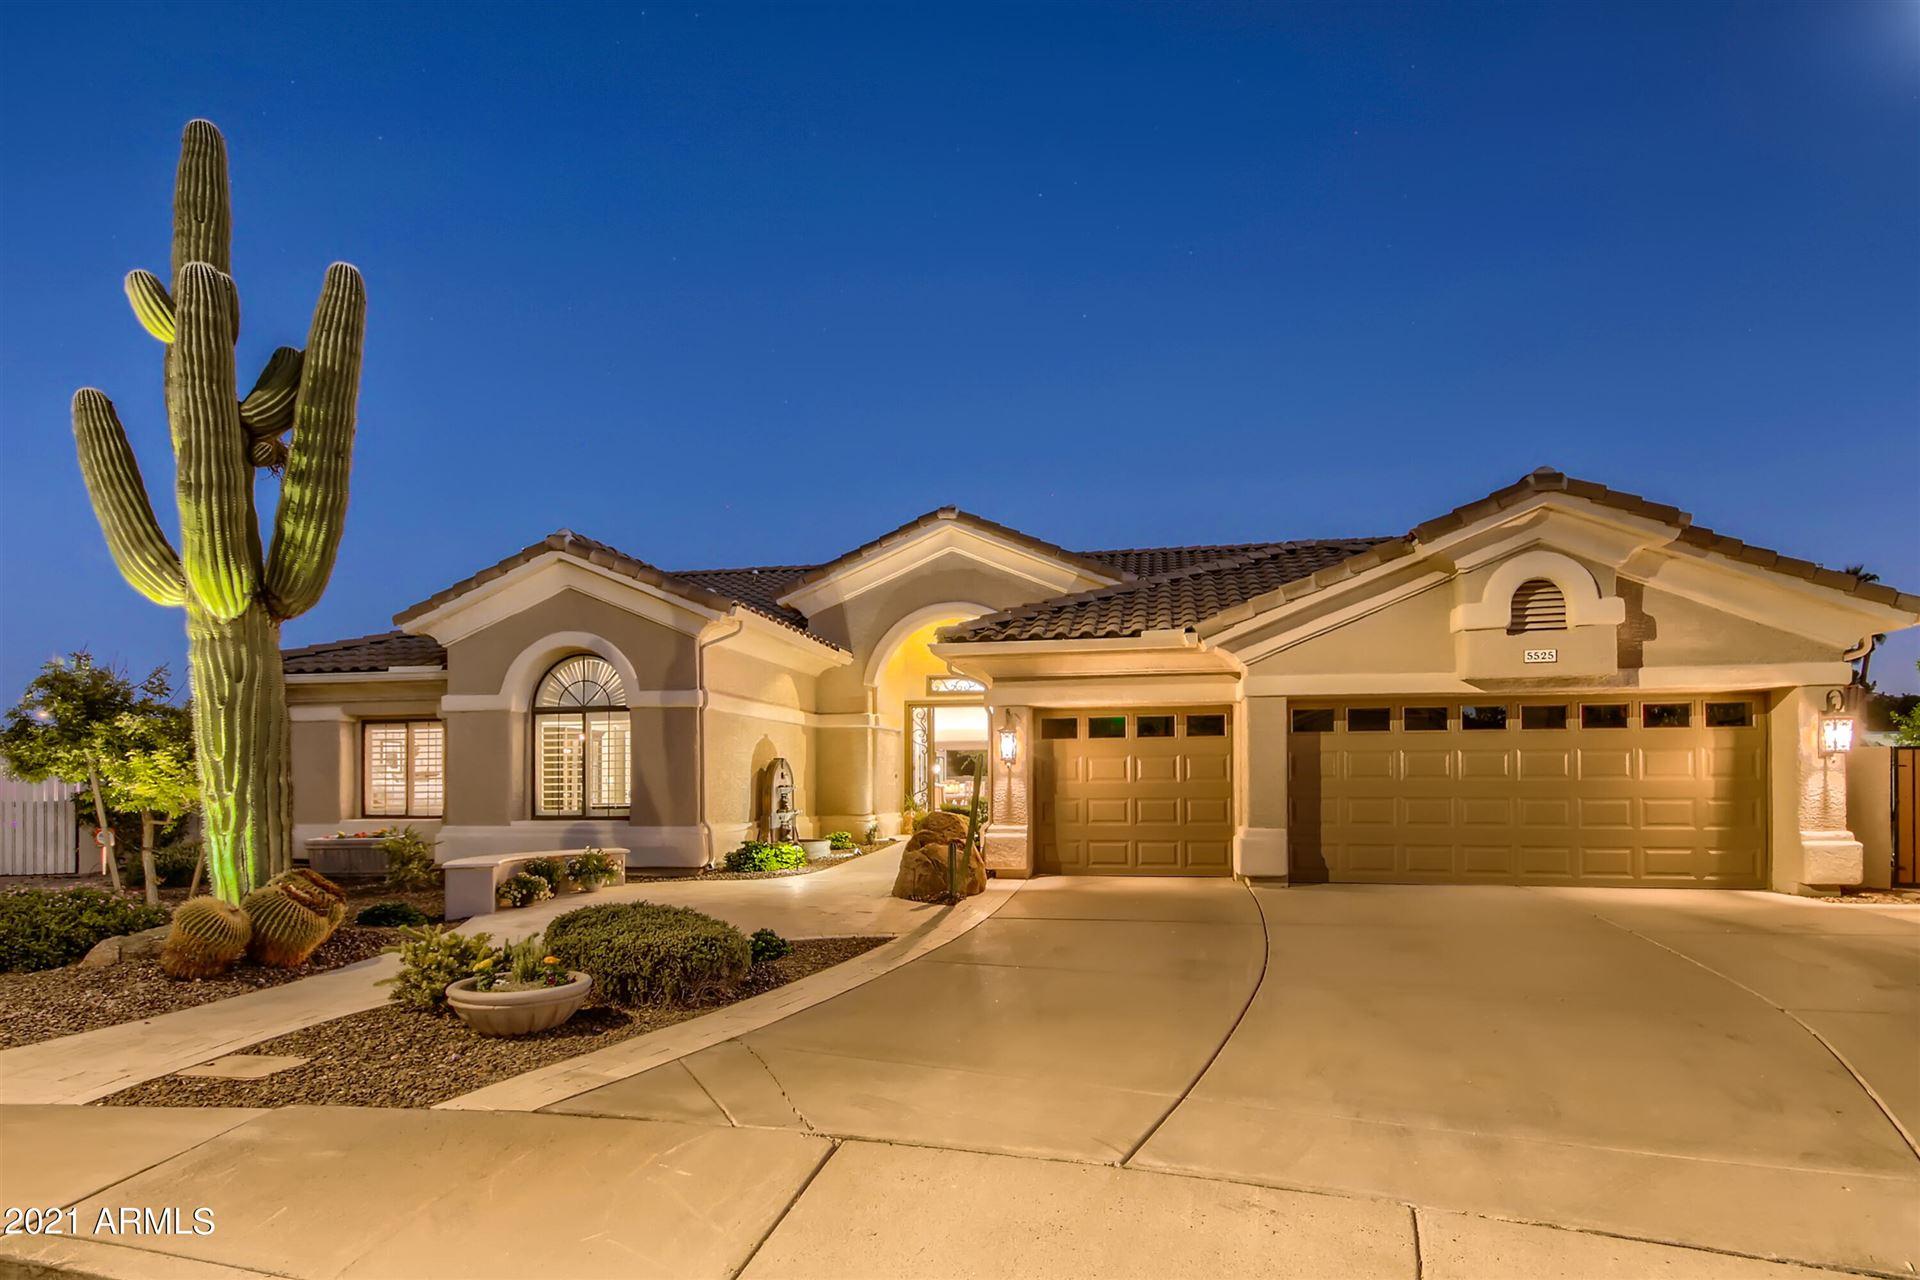 Photo of 5525 E BERYL Avenue, Paradise Valley, AZ 85253 (MLS # 6307611)